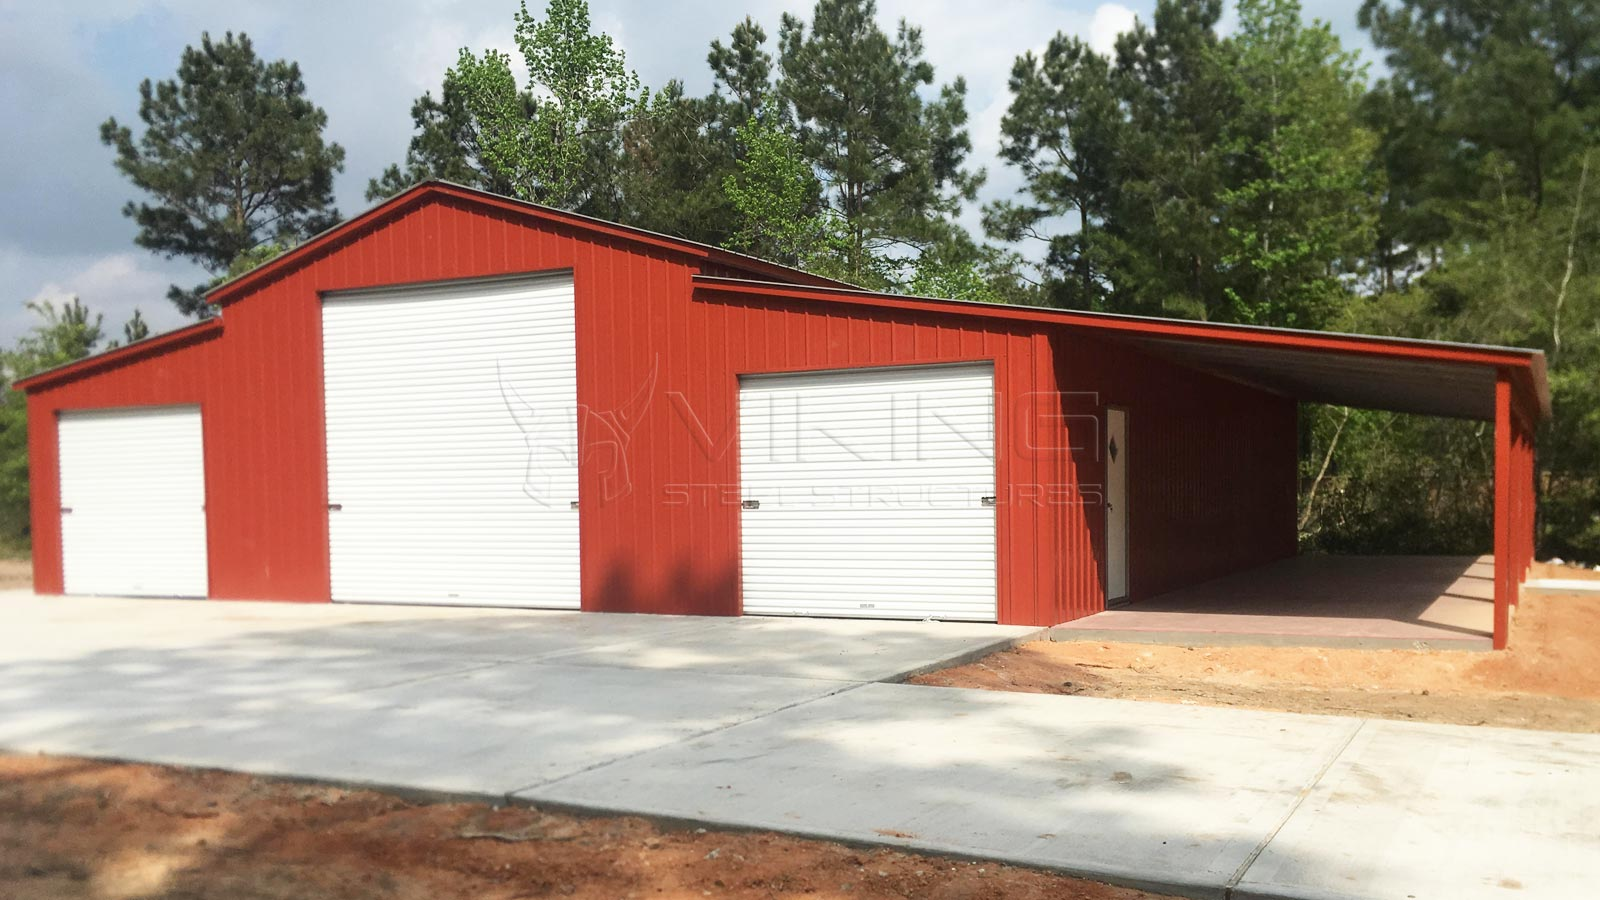 58'x50'x12' All Vertical Carolina Barn Front View